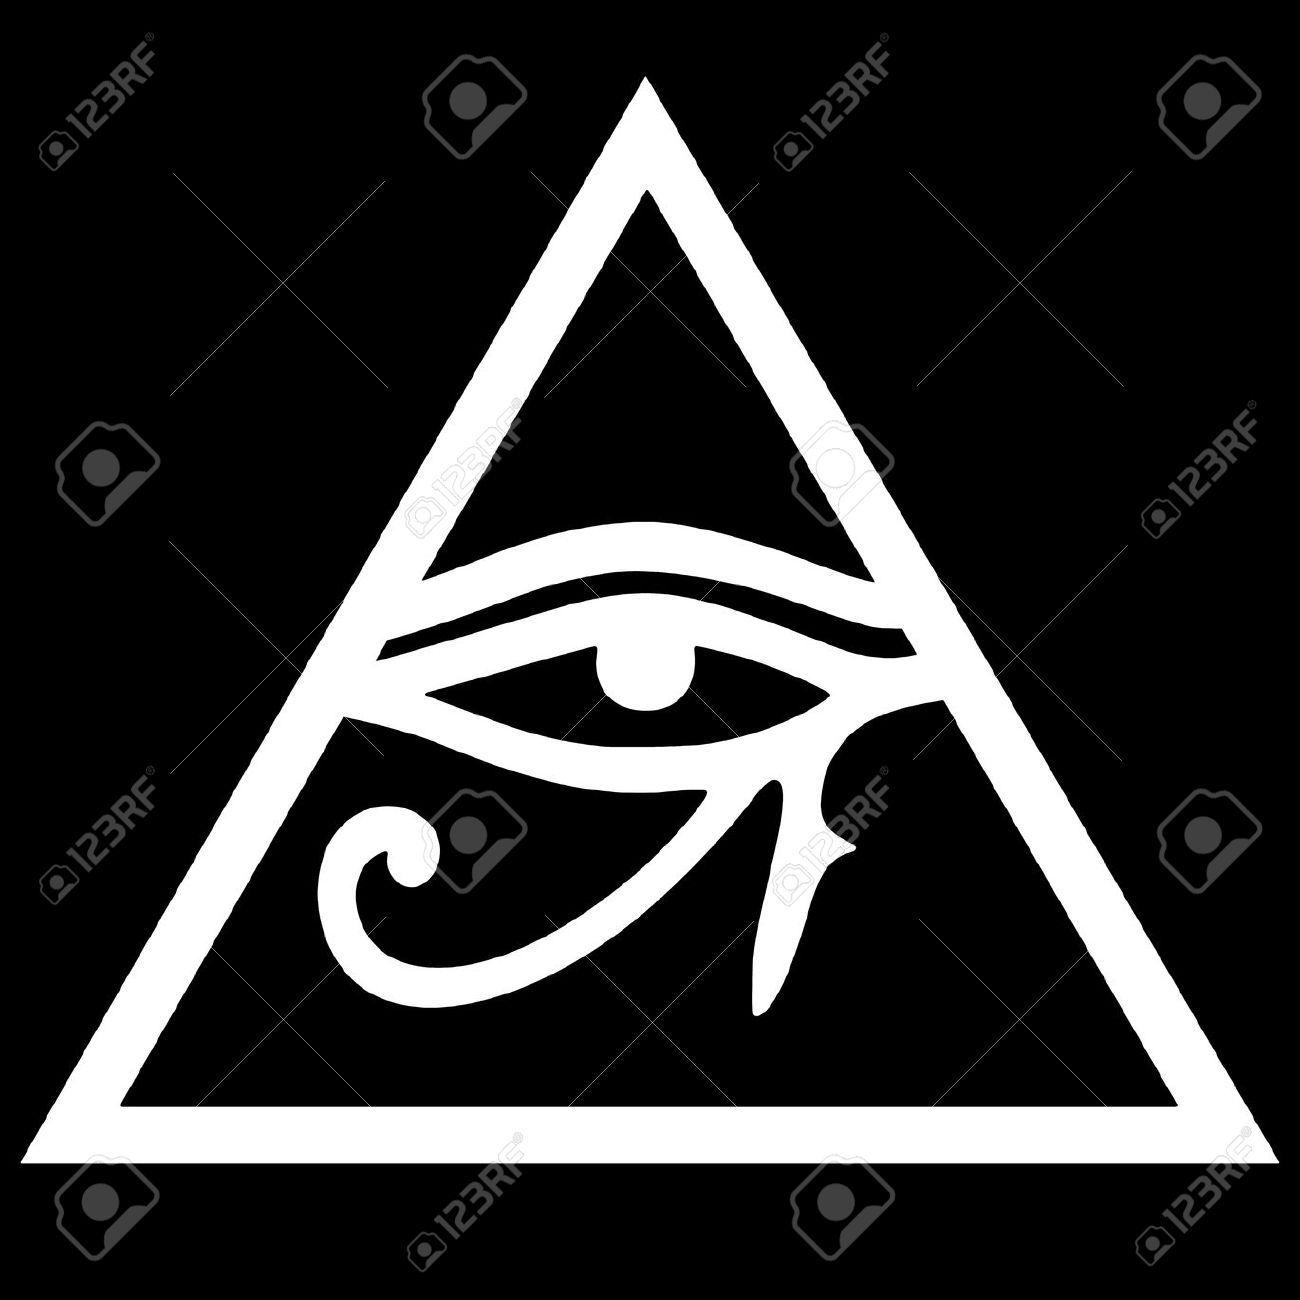 Top Ten Illuminati Symbols | Illuminati Rex